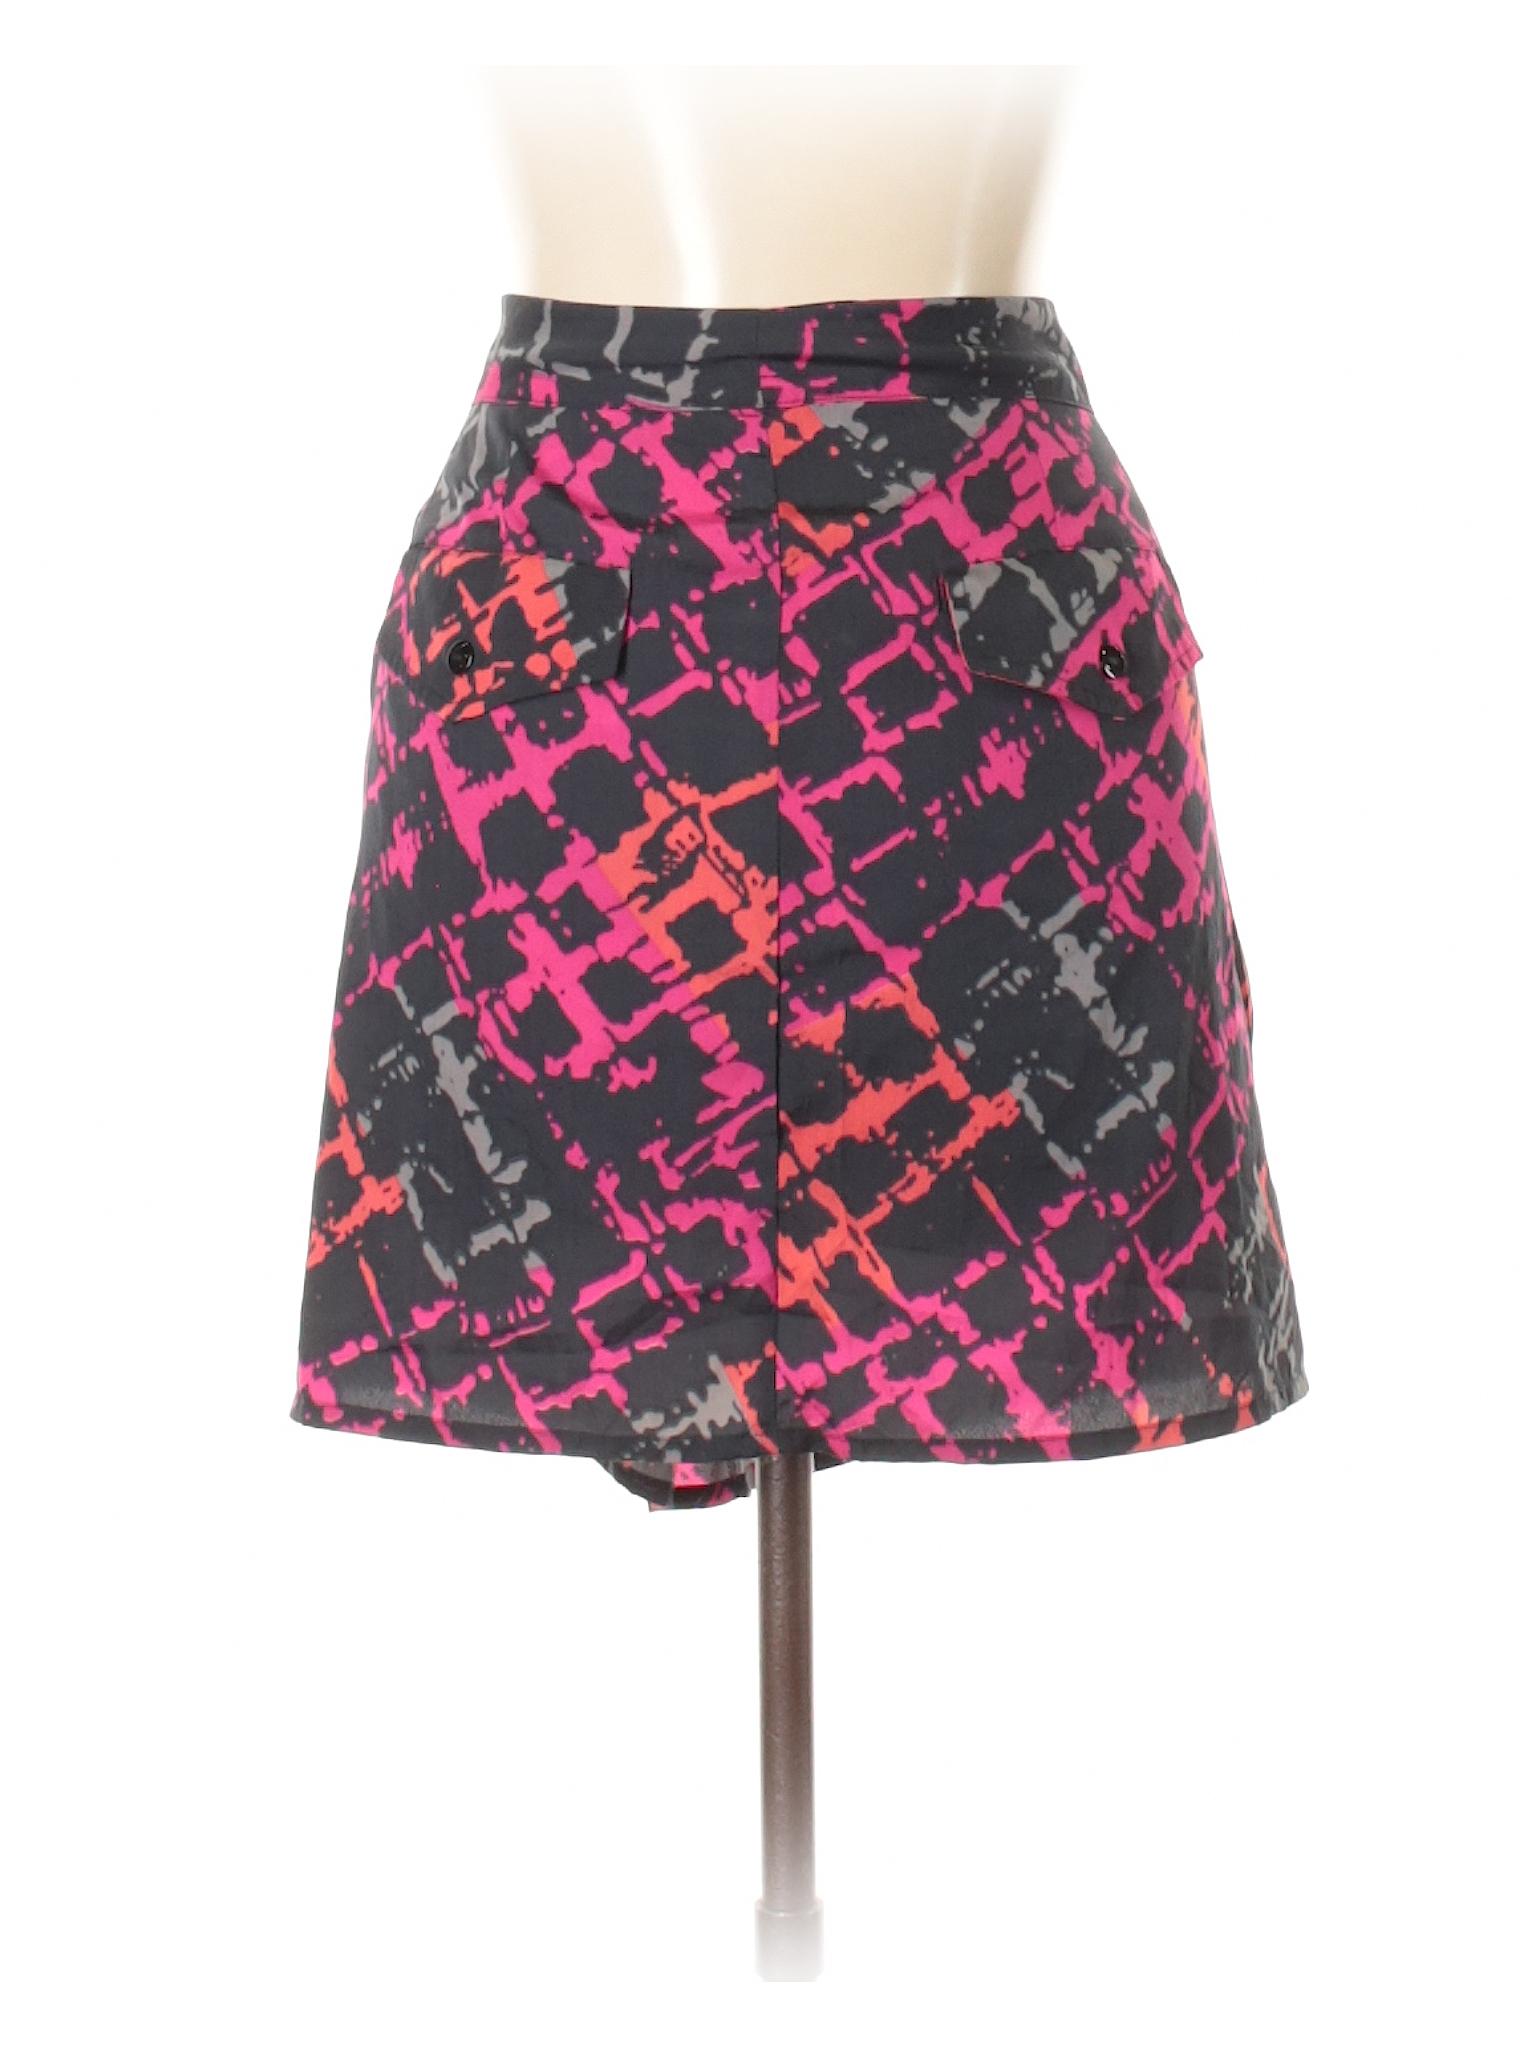 Boutique Casual Boutique Boutique Casual Skirt Casual Skirt Skirt Boutique Skirt Boutique Casual Casual Skirt TCa0gwq